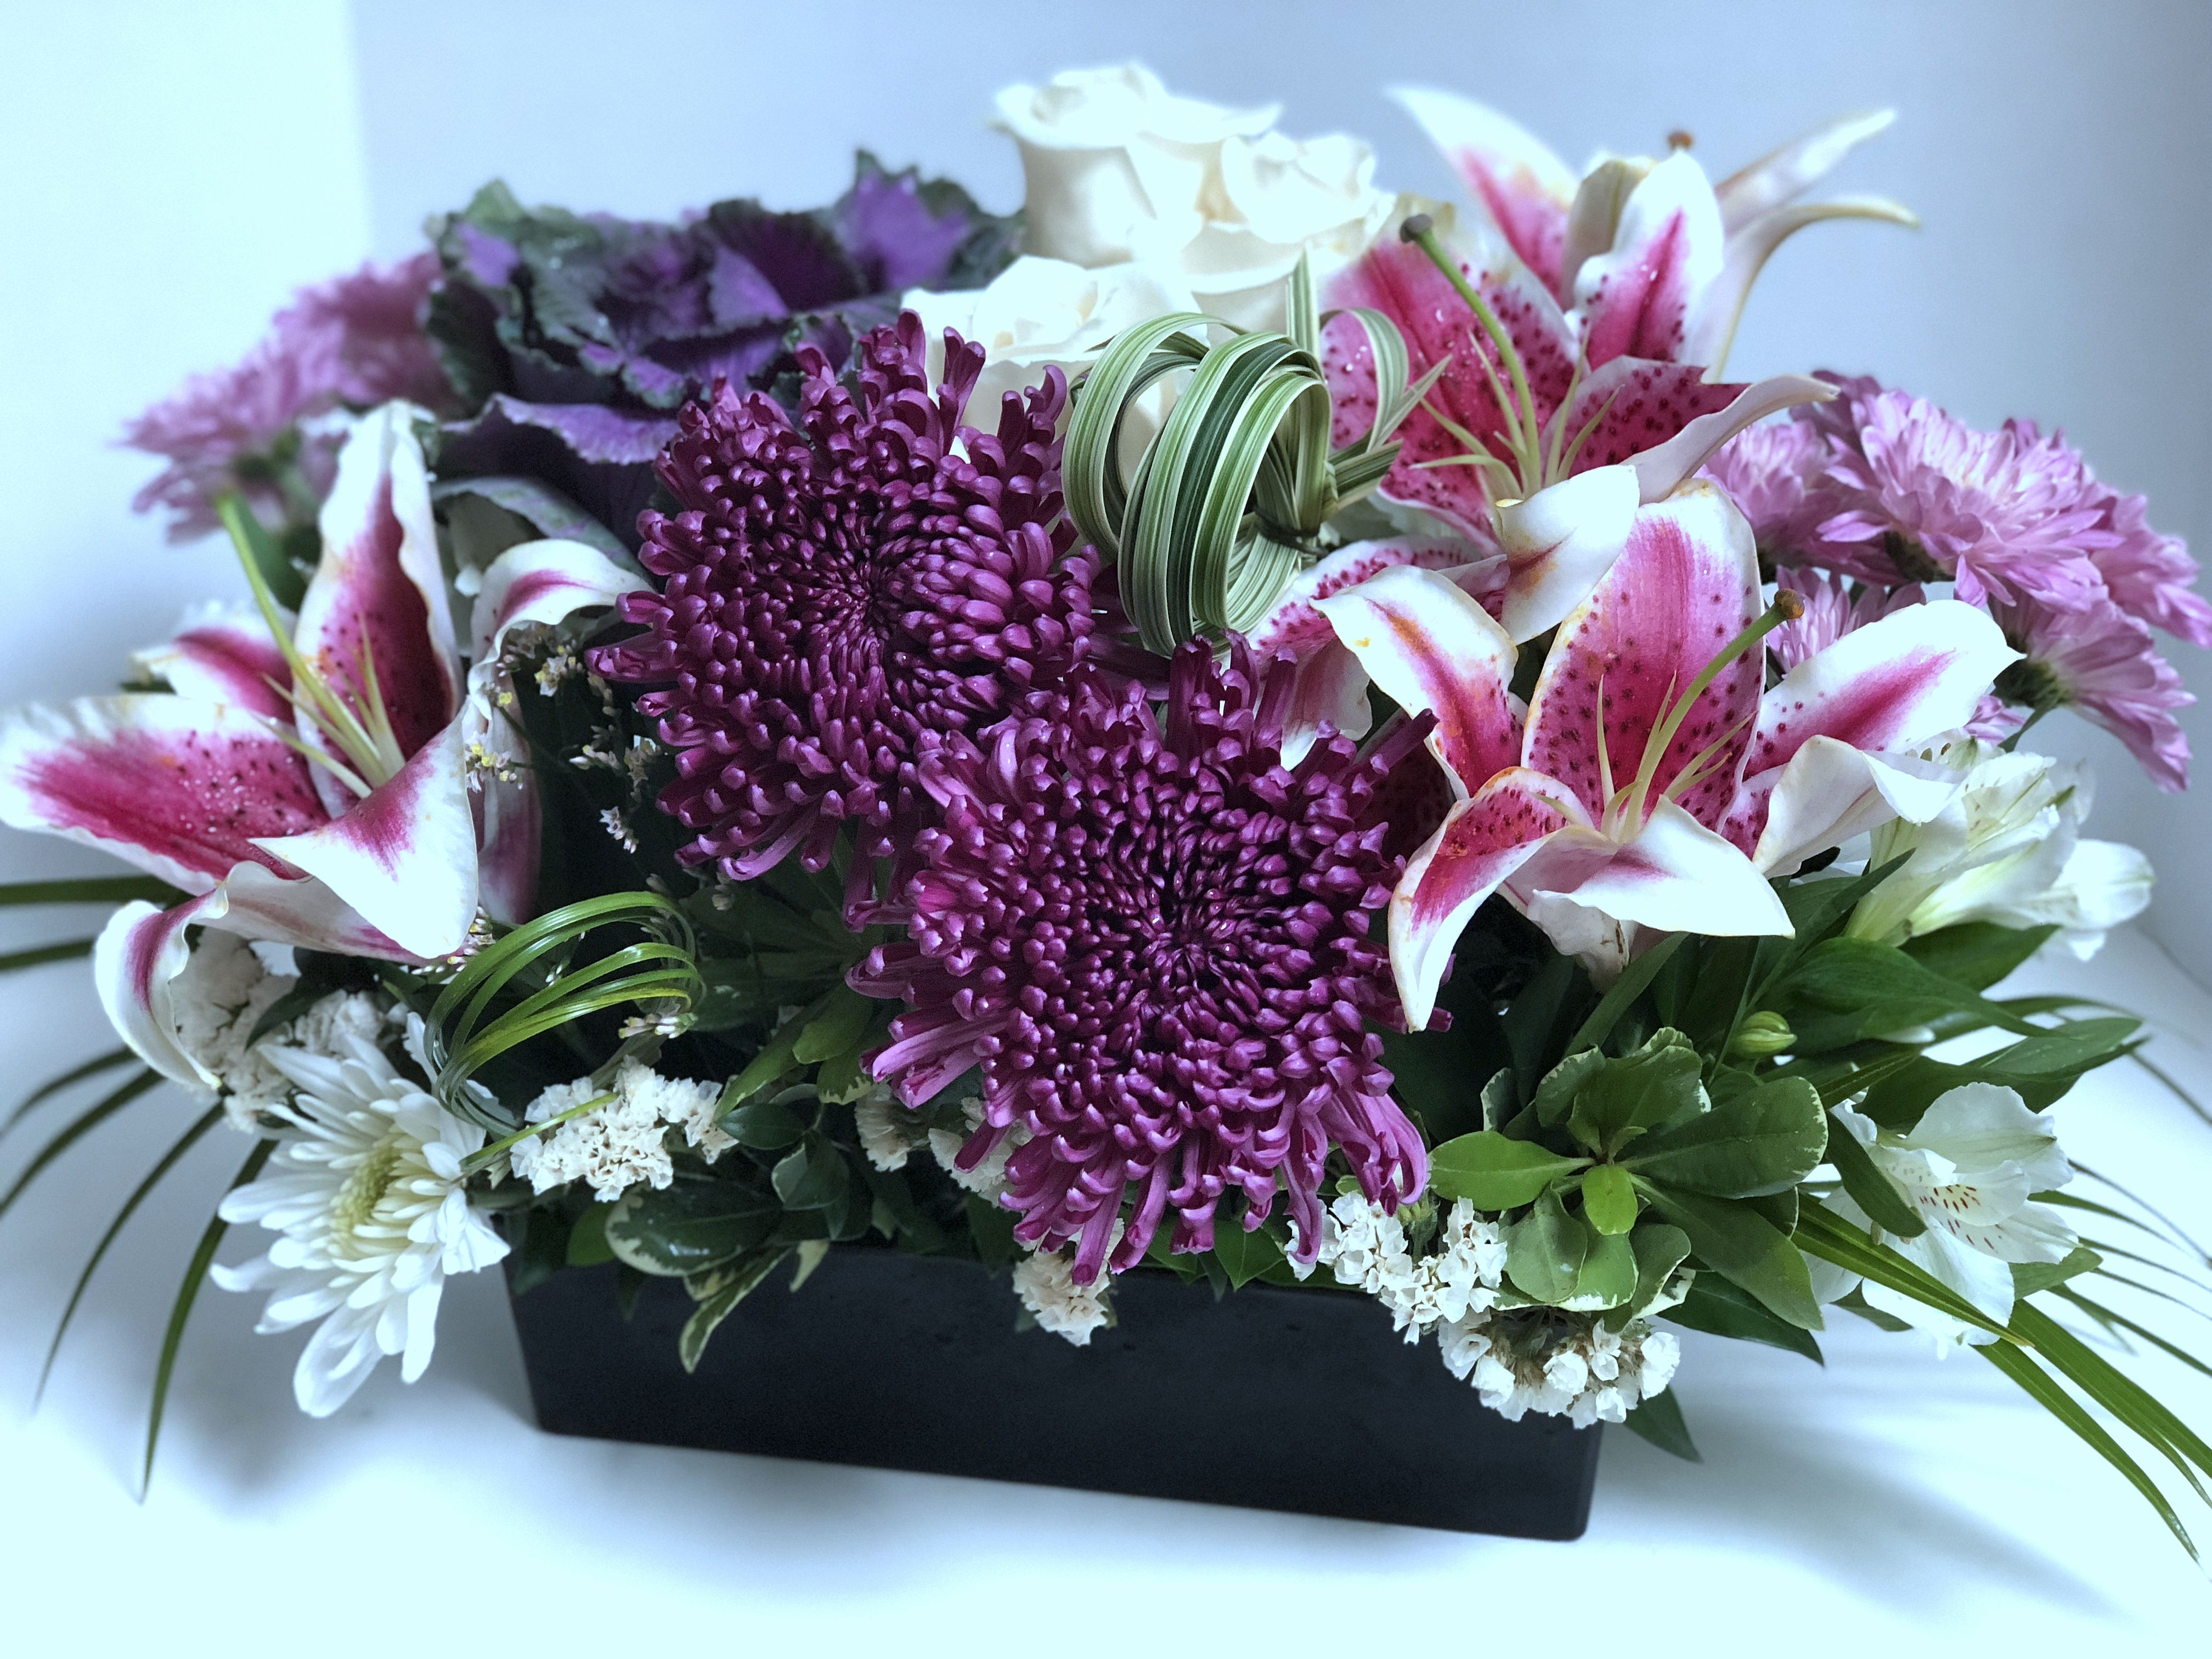 Lilies version 2 w purple cremon white roses